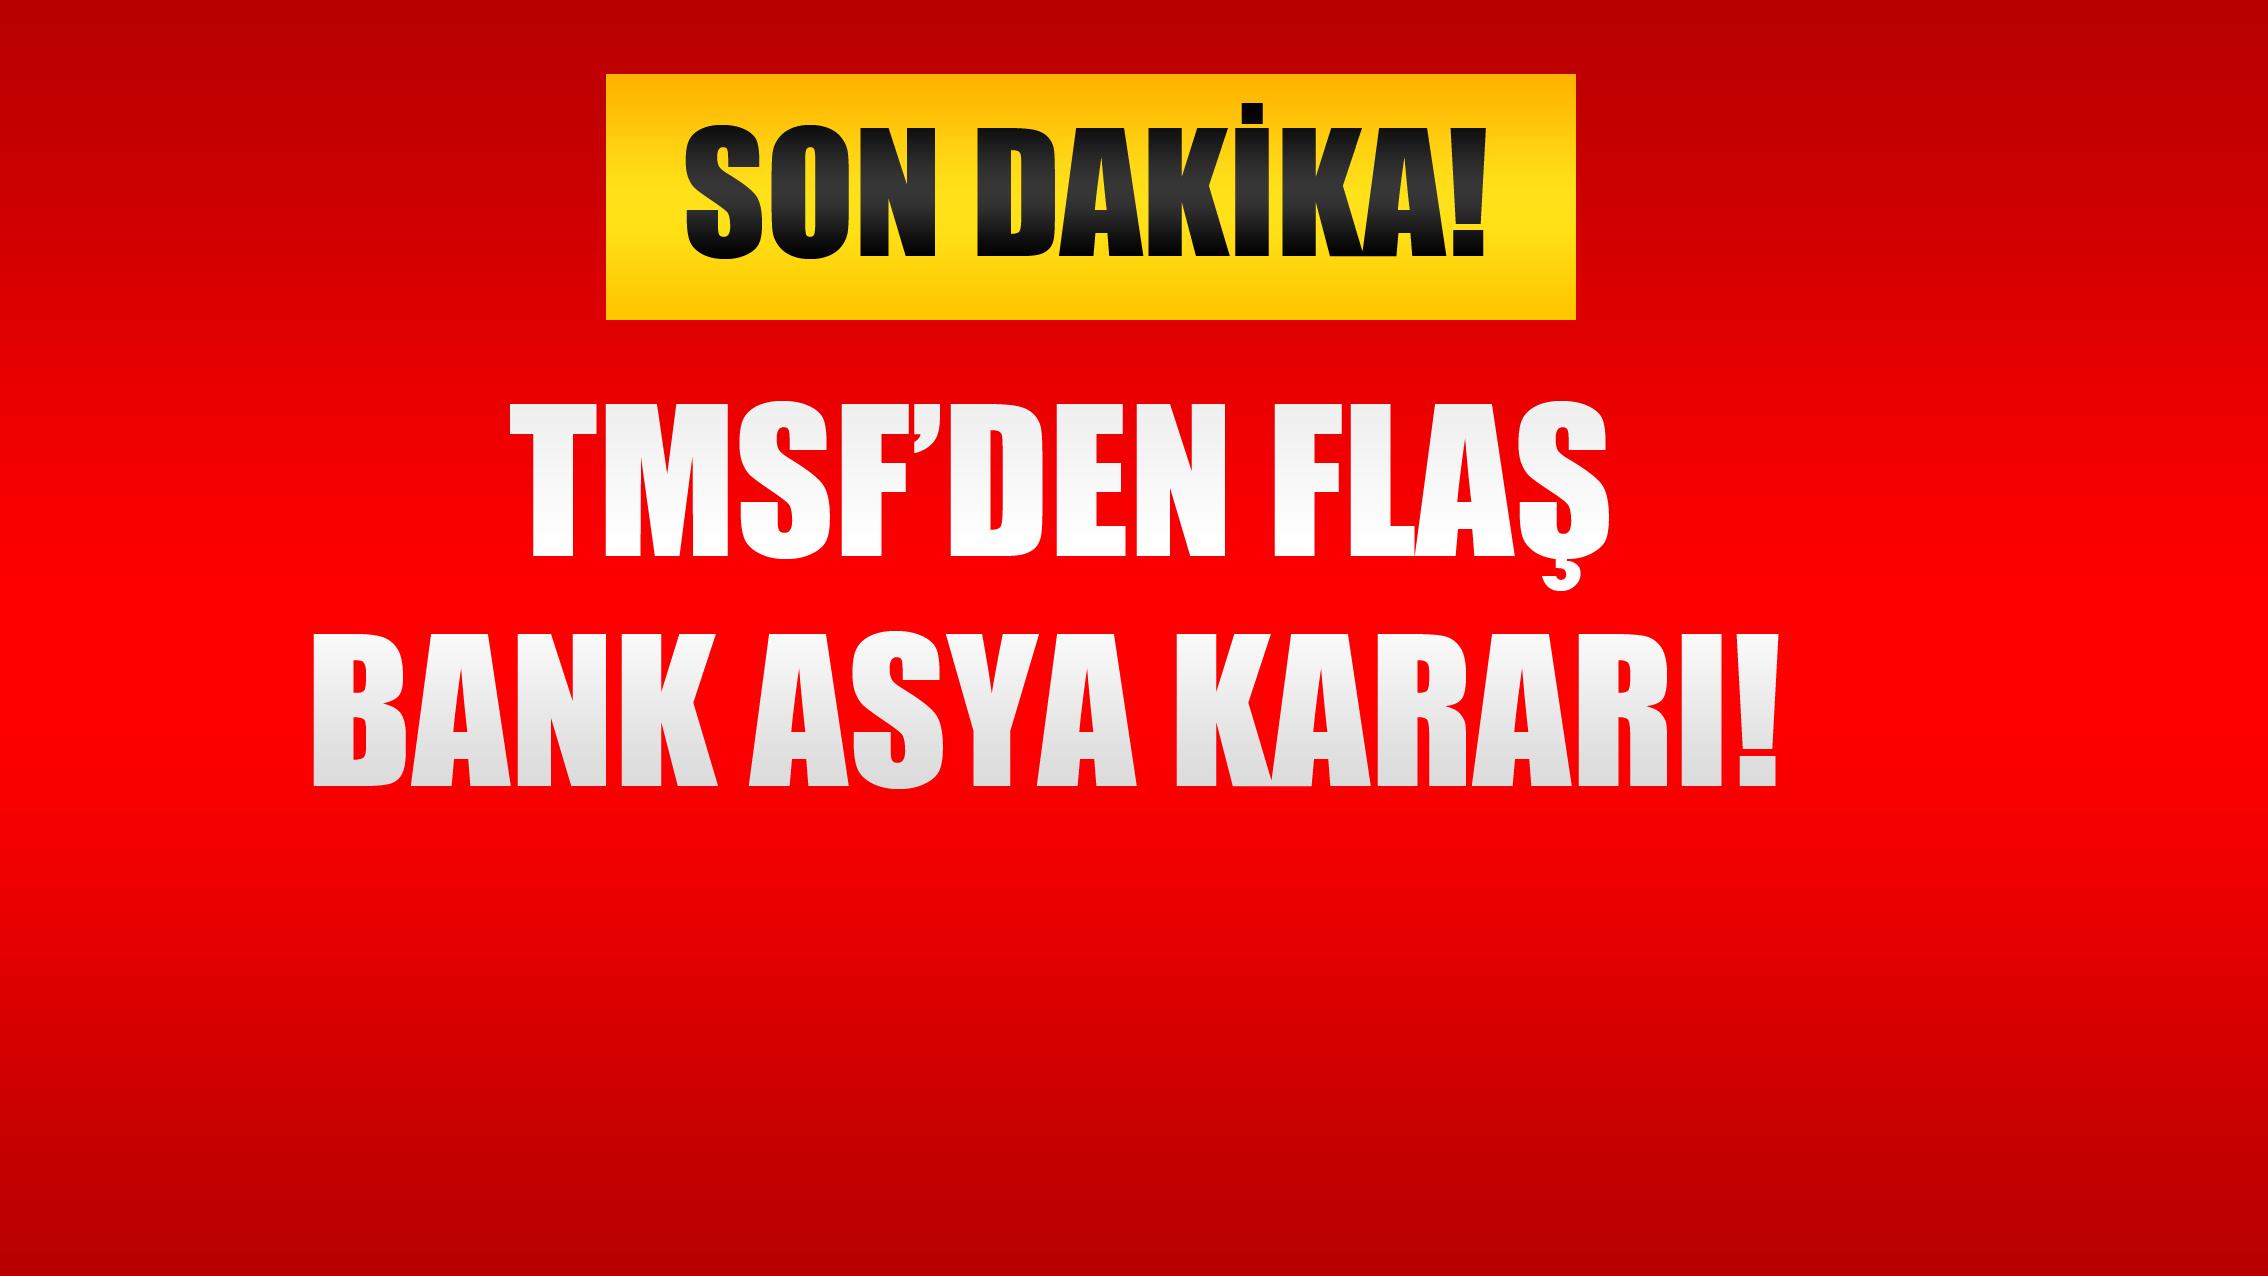 TMSF'den Flaş Bank Asya Kararı!